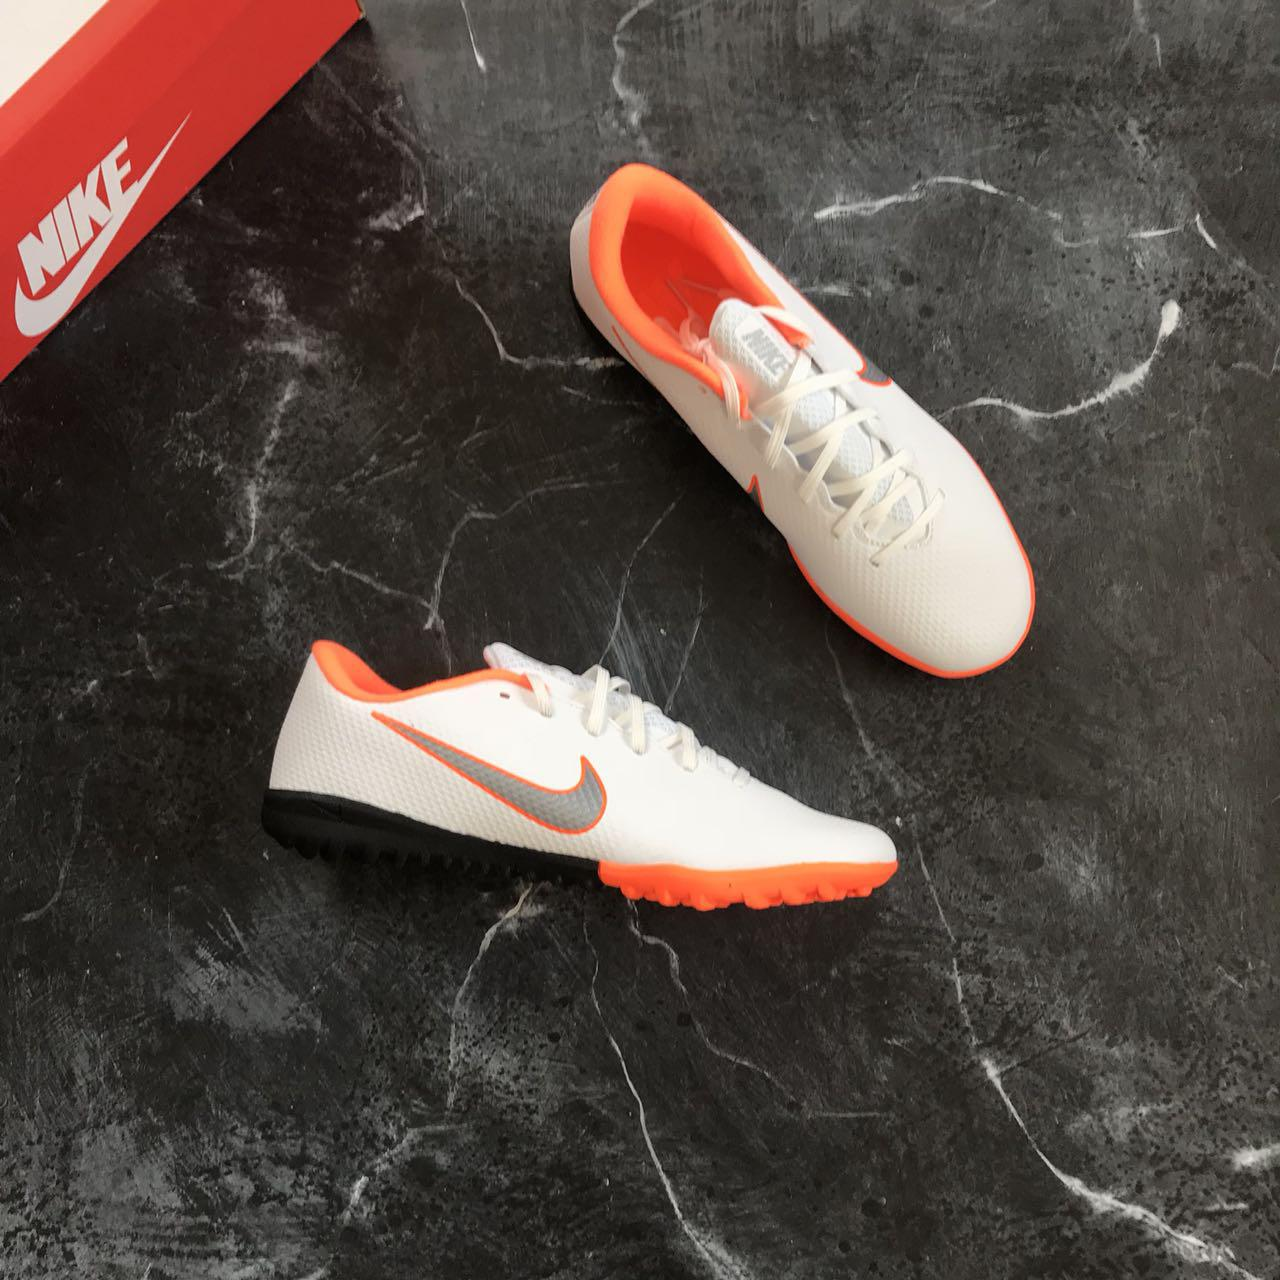 52a18cea Сороконожки Nike Mercurial Vapor Х White - Sport Exclusive магазин  футбольной экипировки в Киеве